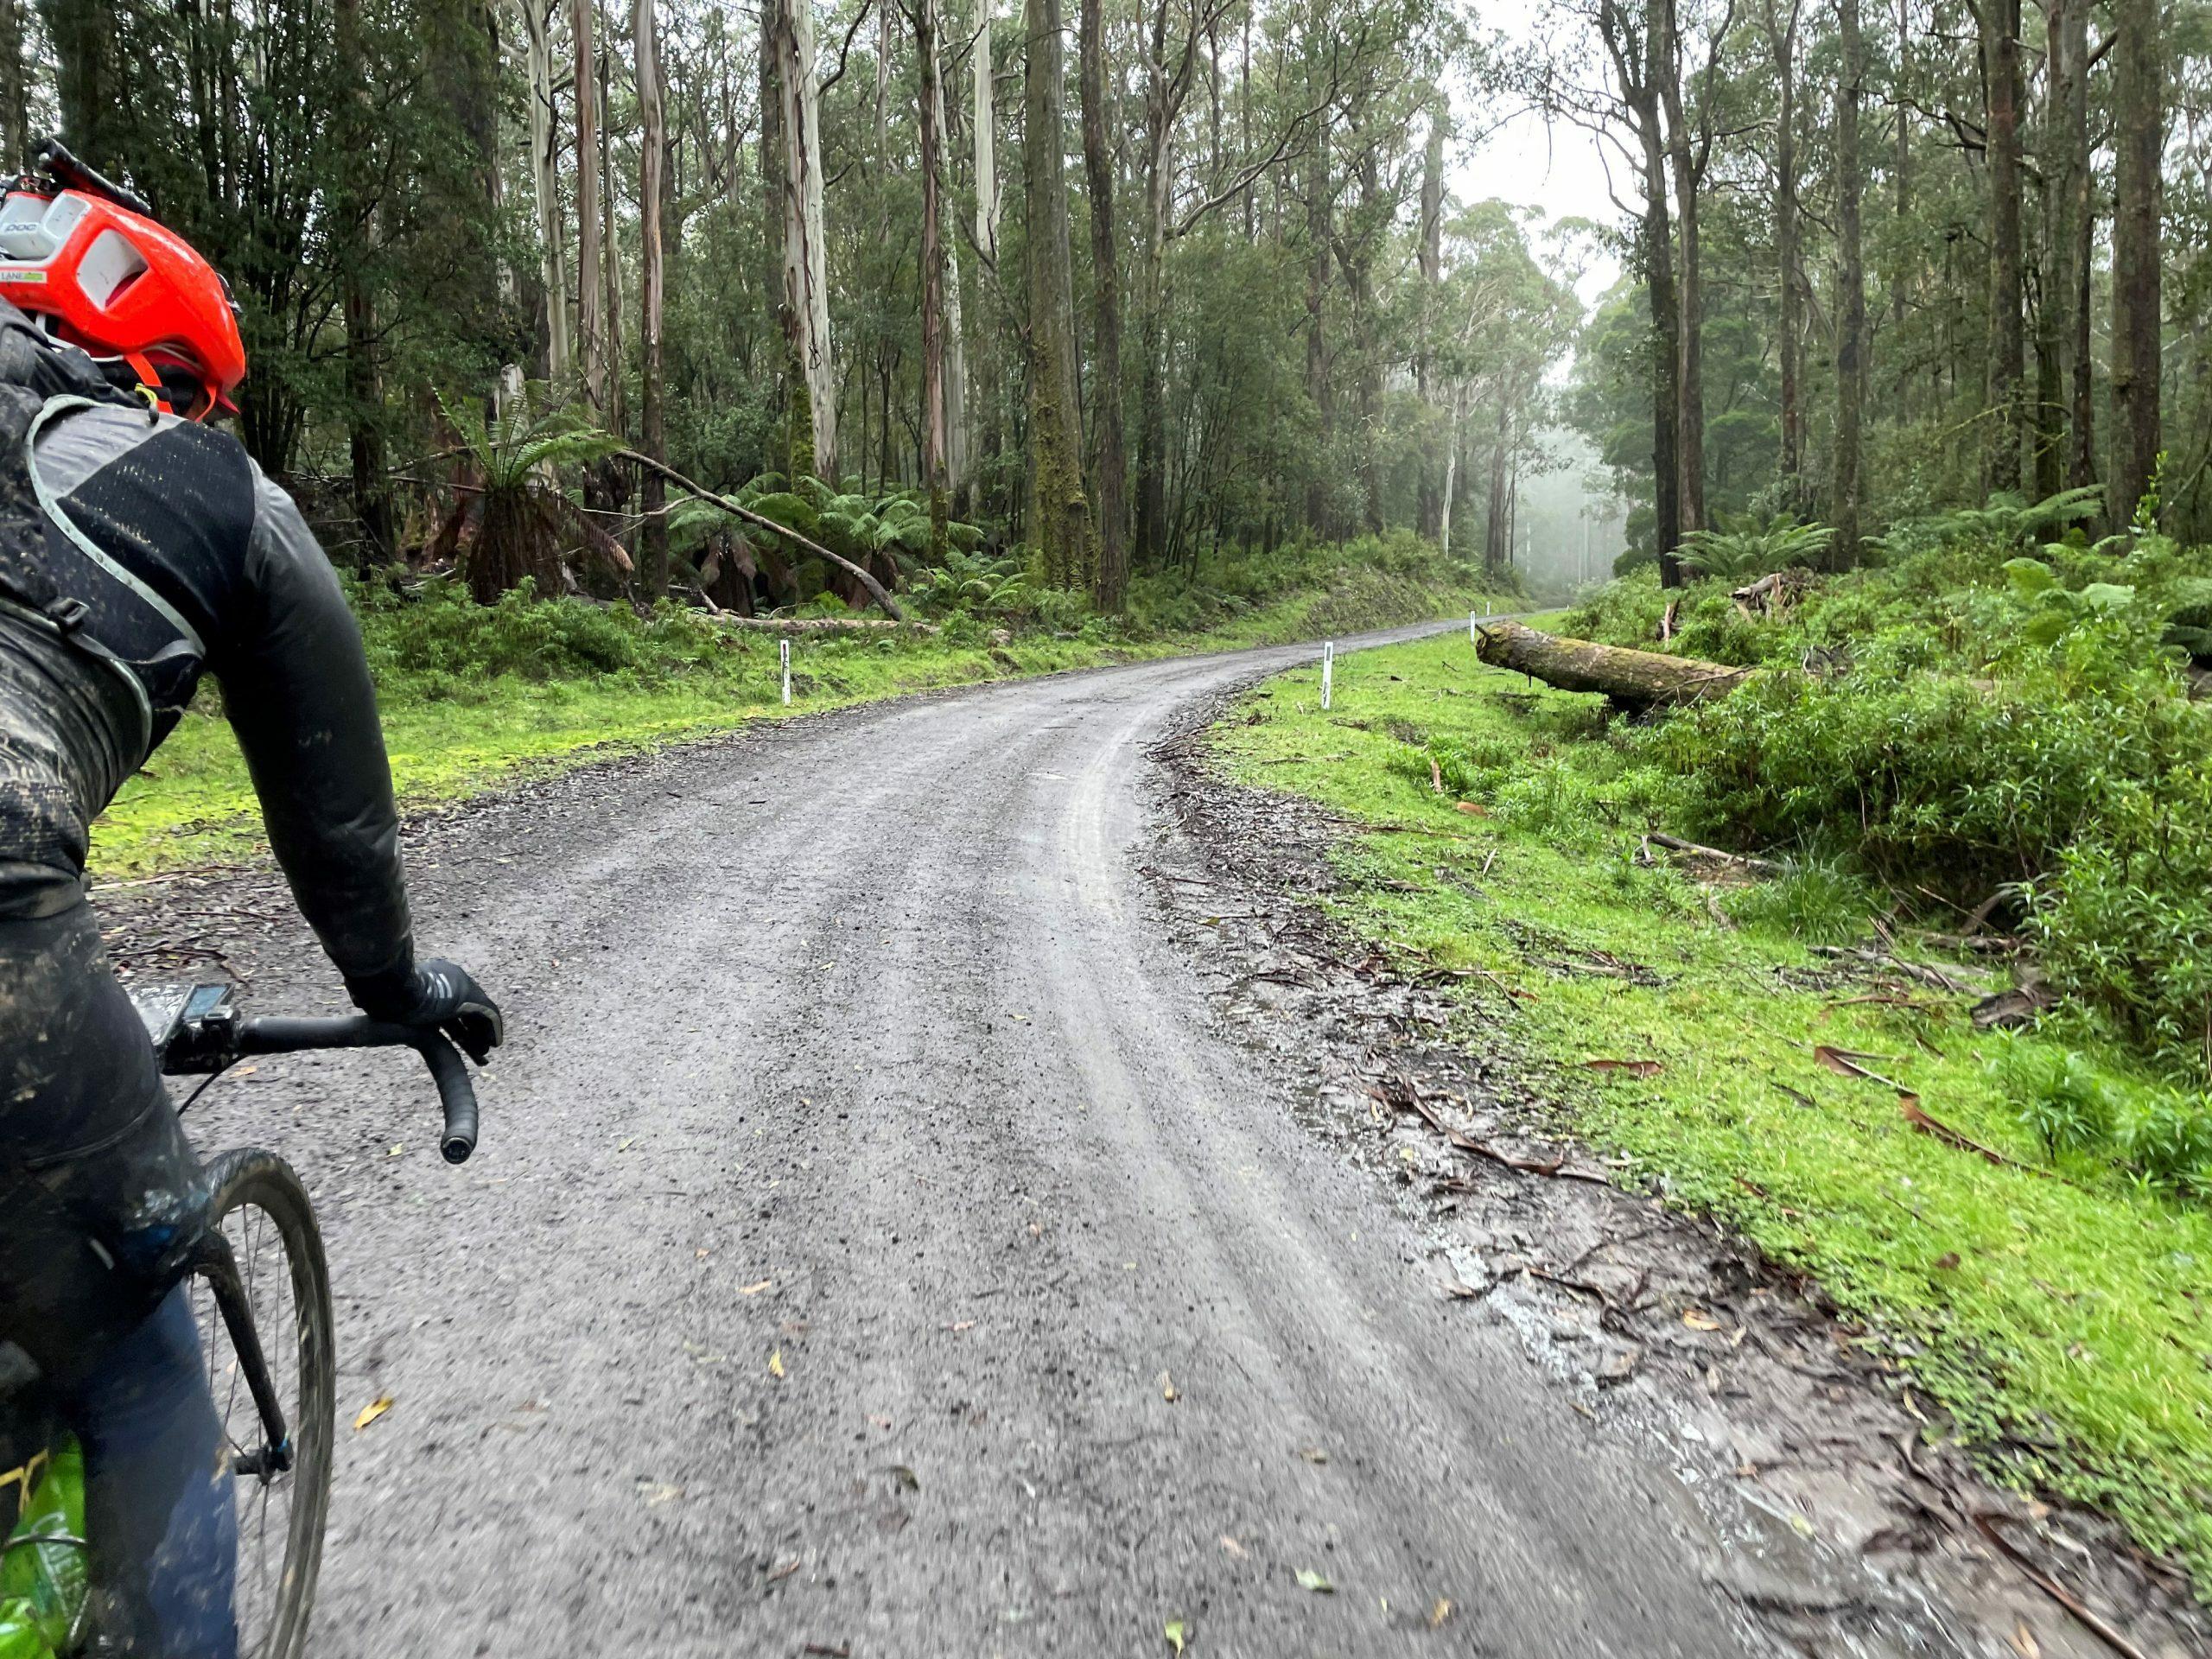 Riding in the Otways on the winter solstice 300, rider recap by Steven Sullivan